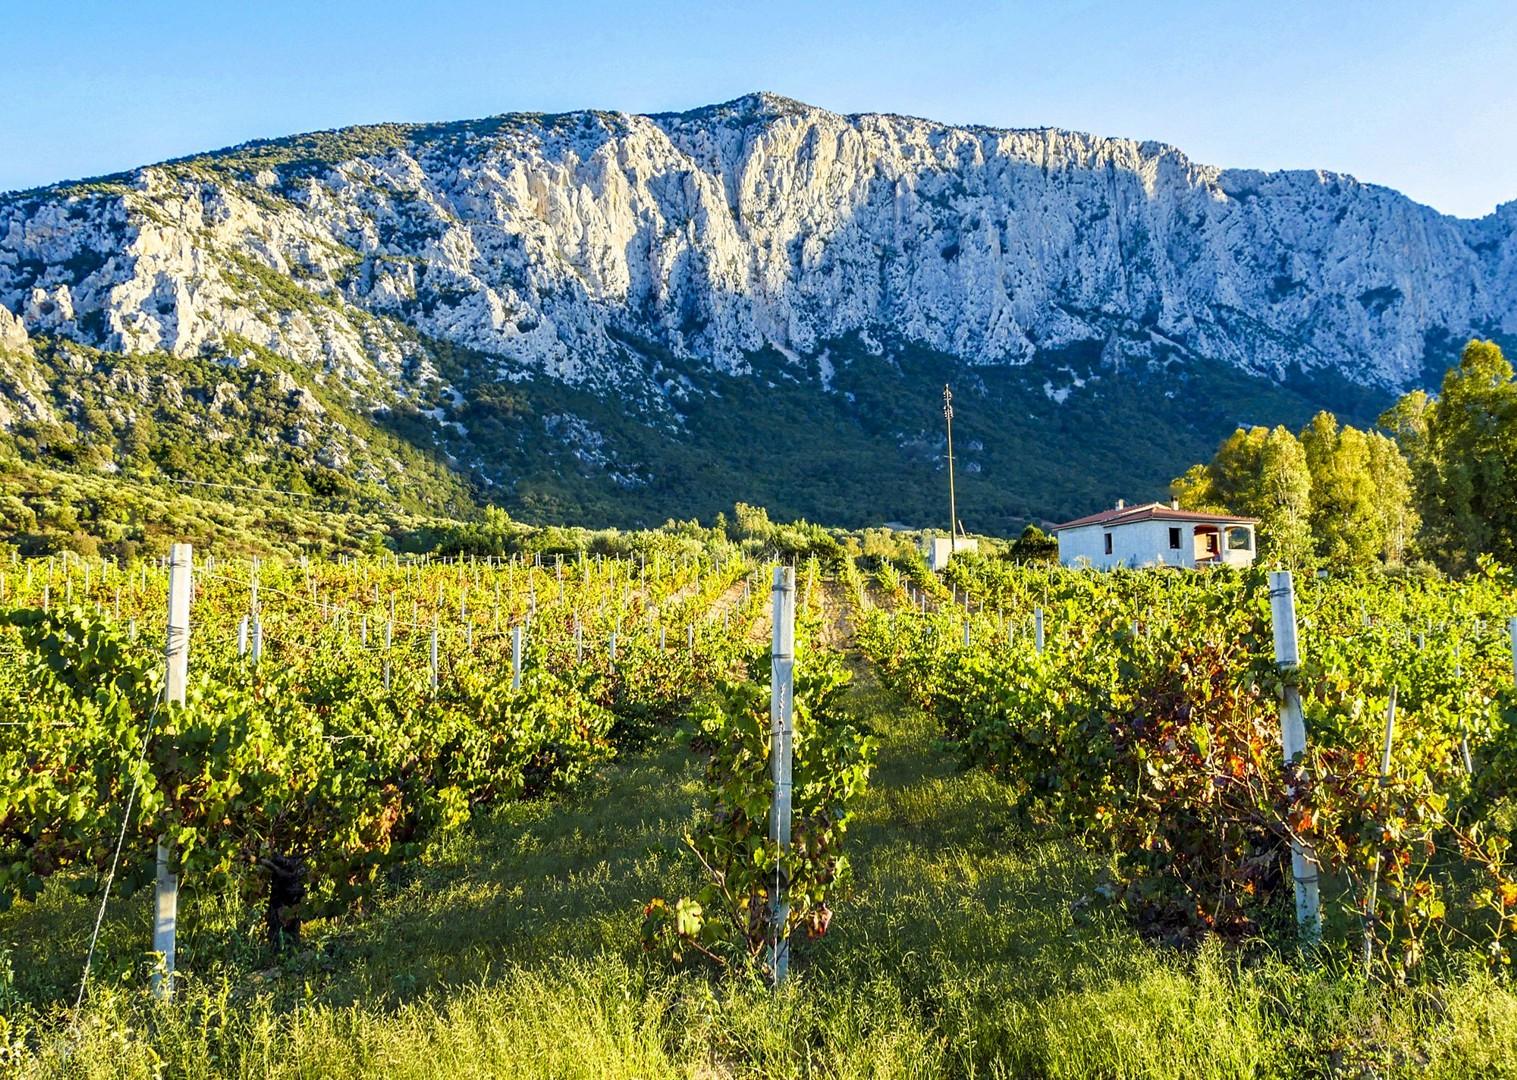 su-gologne-self-guided-leisure-cycling-holiday-skedaddle-vineyard-mountains.jpg - Italy - Sardinia - Island Flavours - Self-Guided Leisure Cycling Holiday - Italia Leisure and Family Cycling